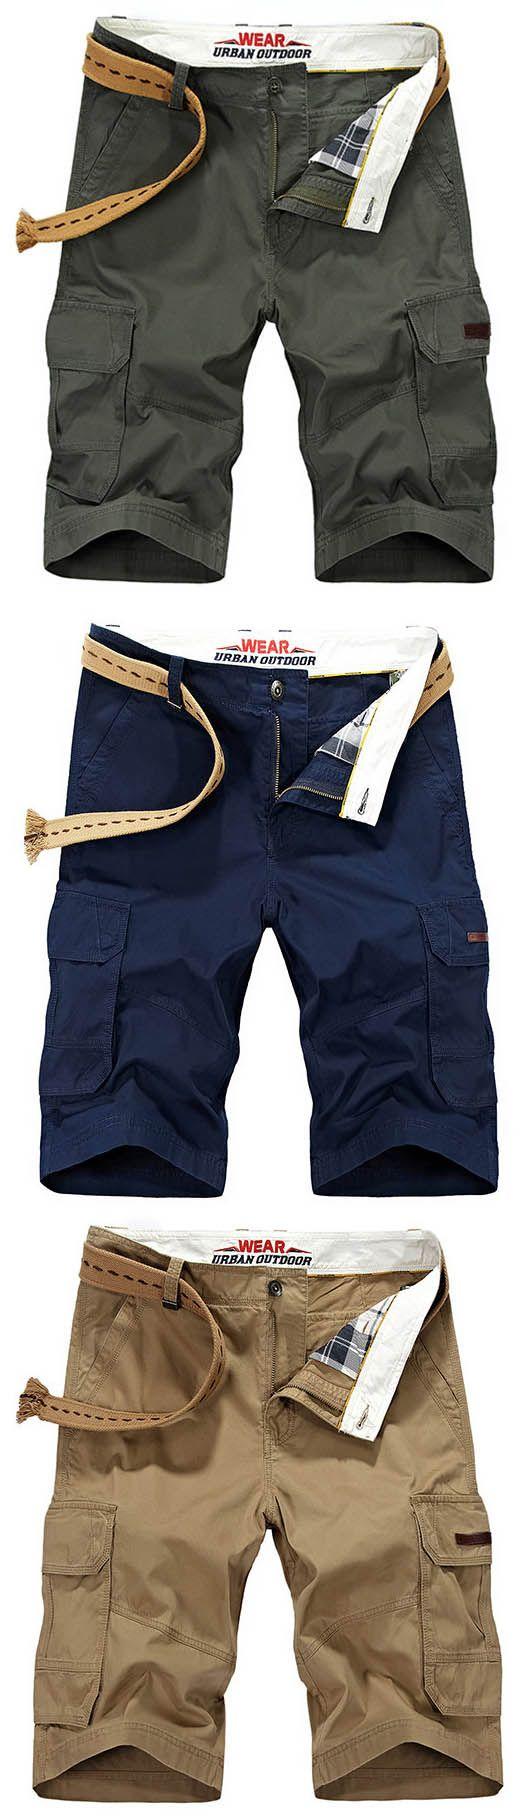 AFSJEEP Mens Summer Solid Color Big Pockets Knee Length Casual Cotton Shorts